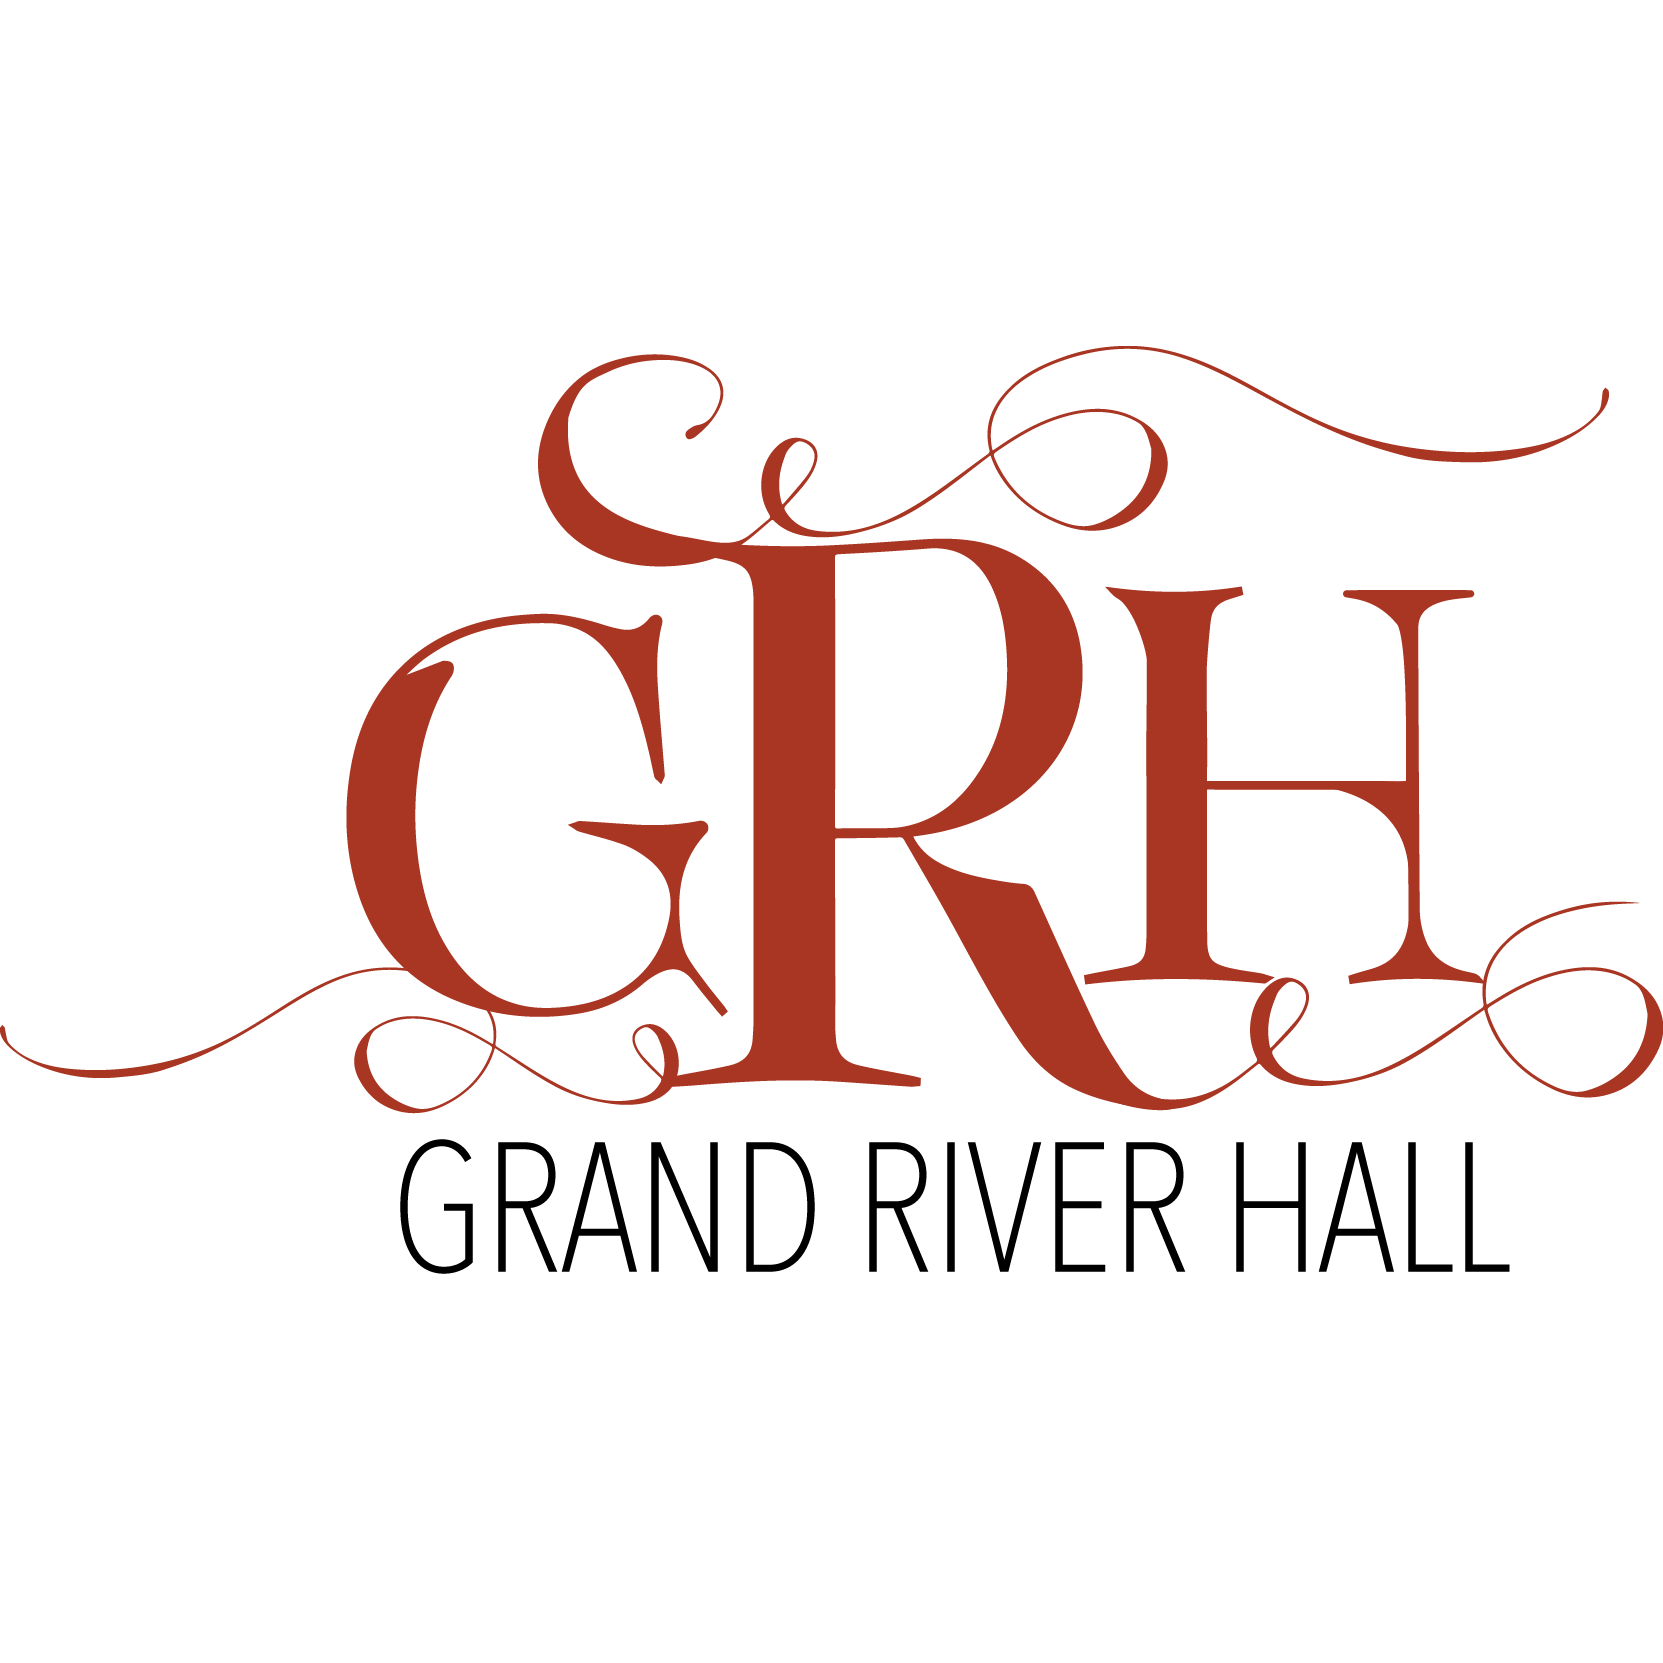 Grand River Hall